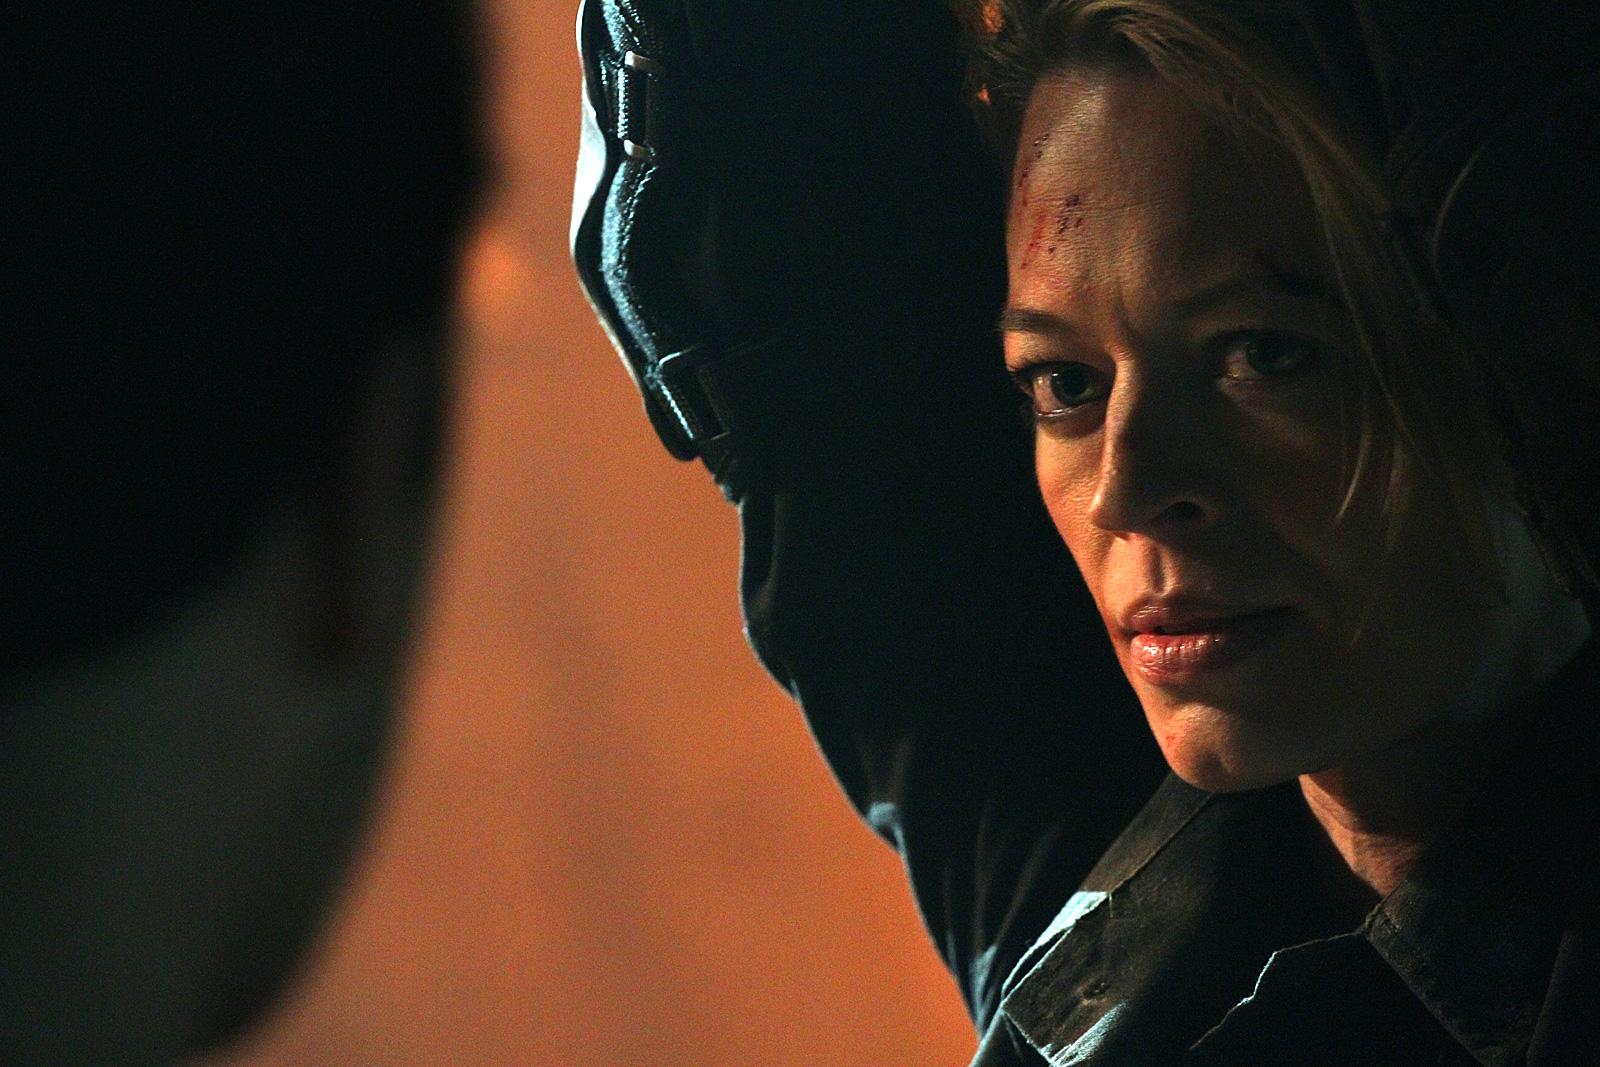 Jeri Ryan As Sonya Blade - First Official Image • Mortal Kombat Secrets